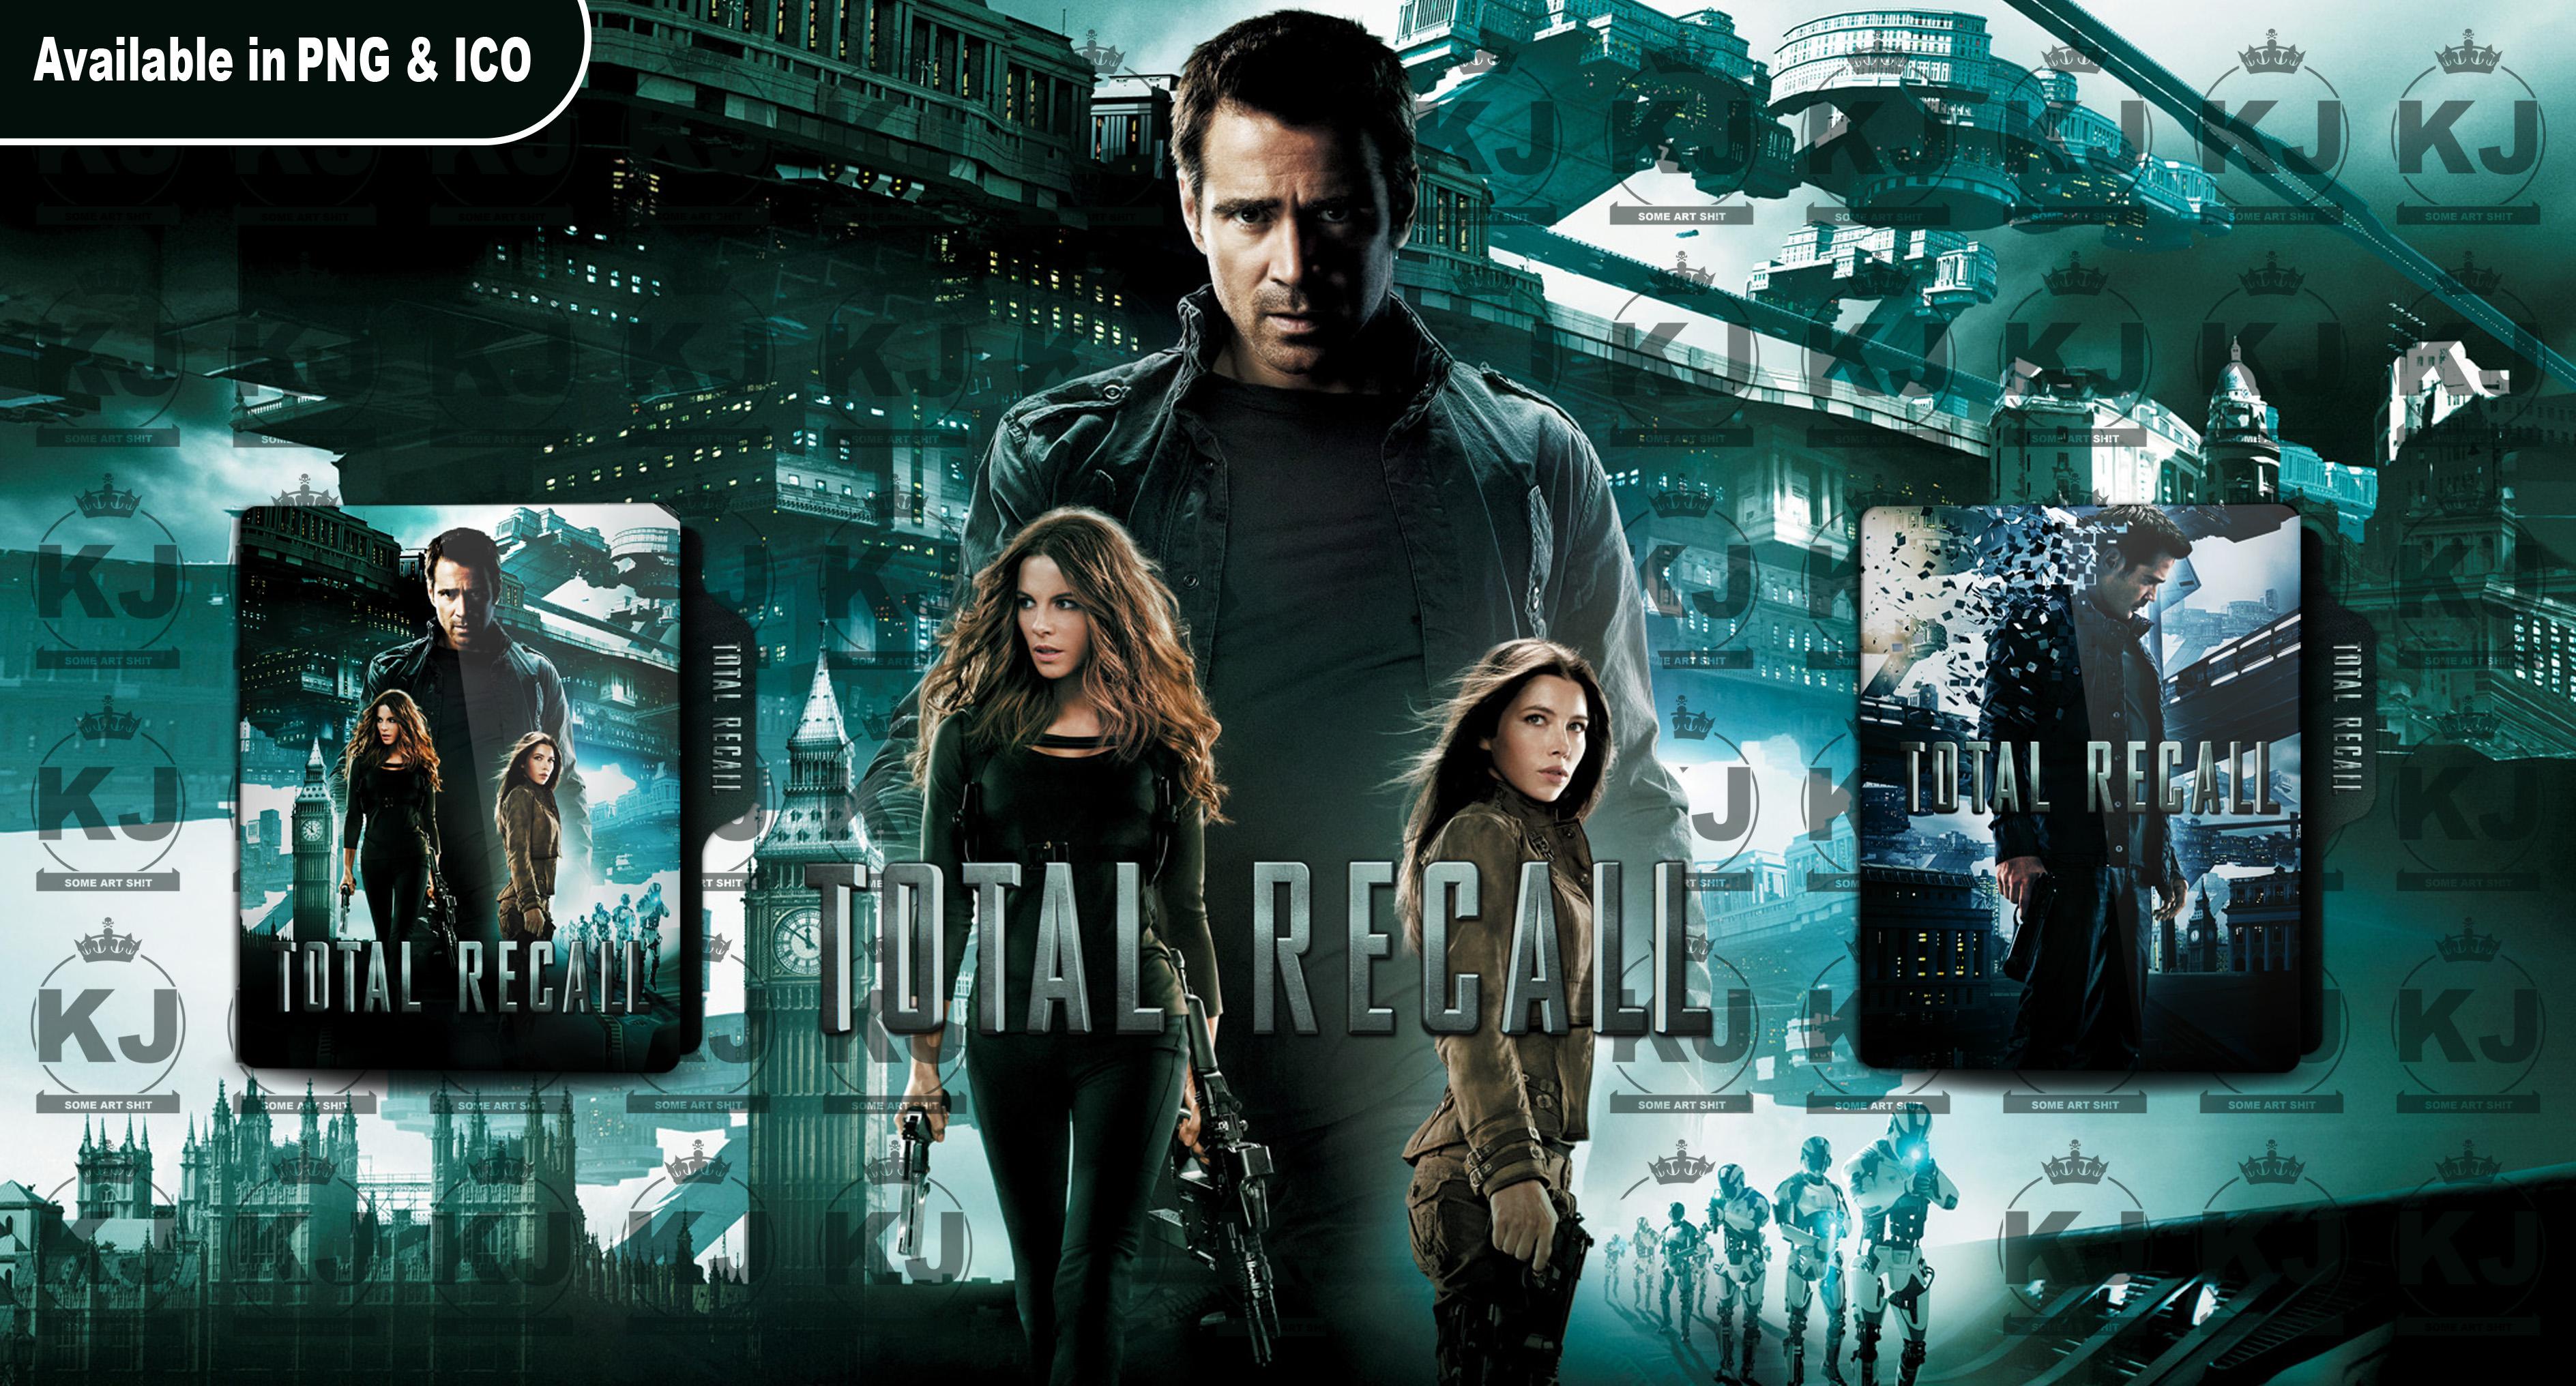 Total Recall 2012 By Kingjoe93 On Deviantart